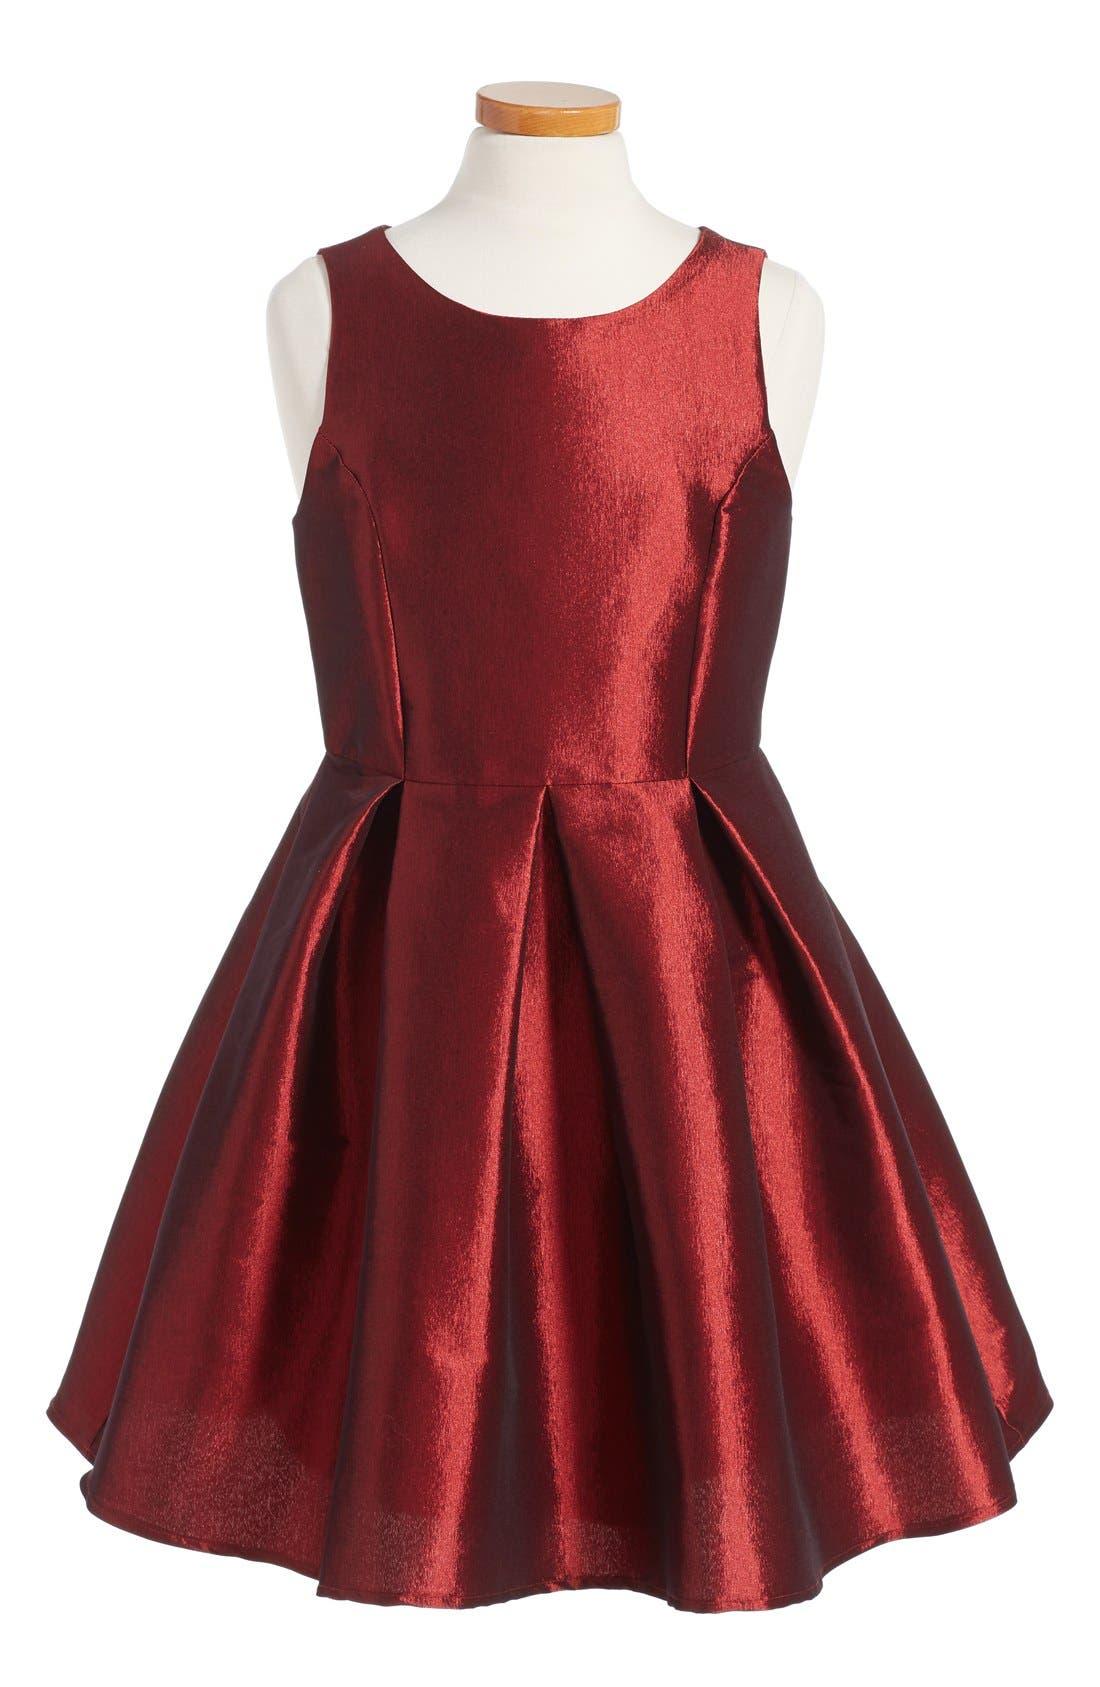 Main Image - Soprano Sleeveless Skater Dress (Big Girls)